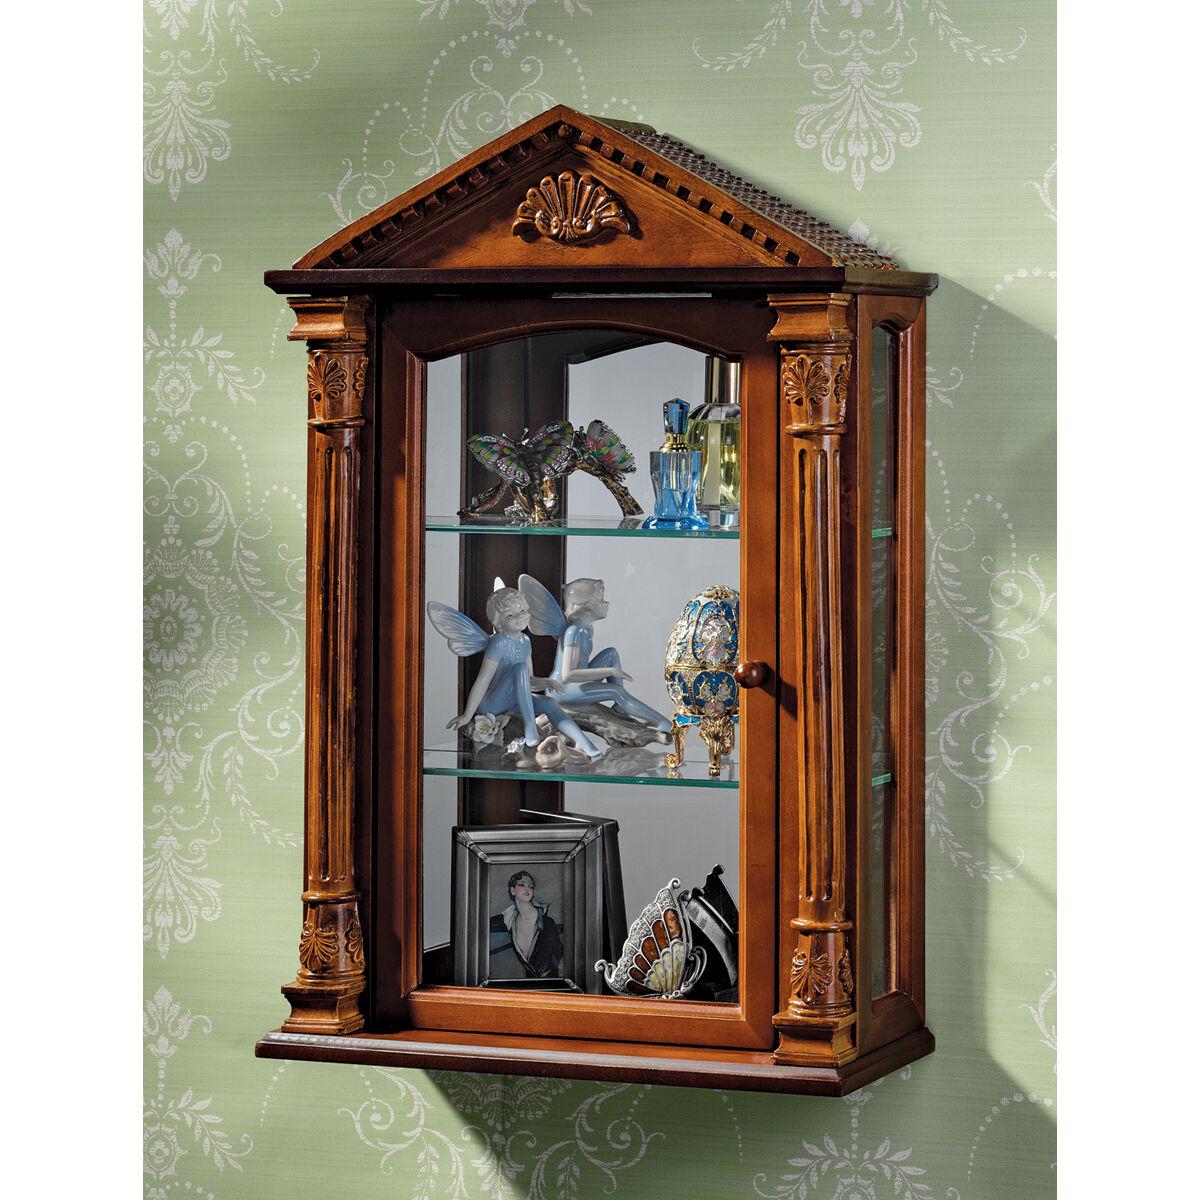 Corinthian Columns Pediment Mirror Backed Wall Curio Cabinet